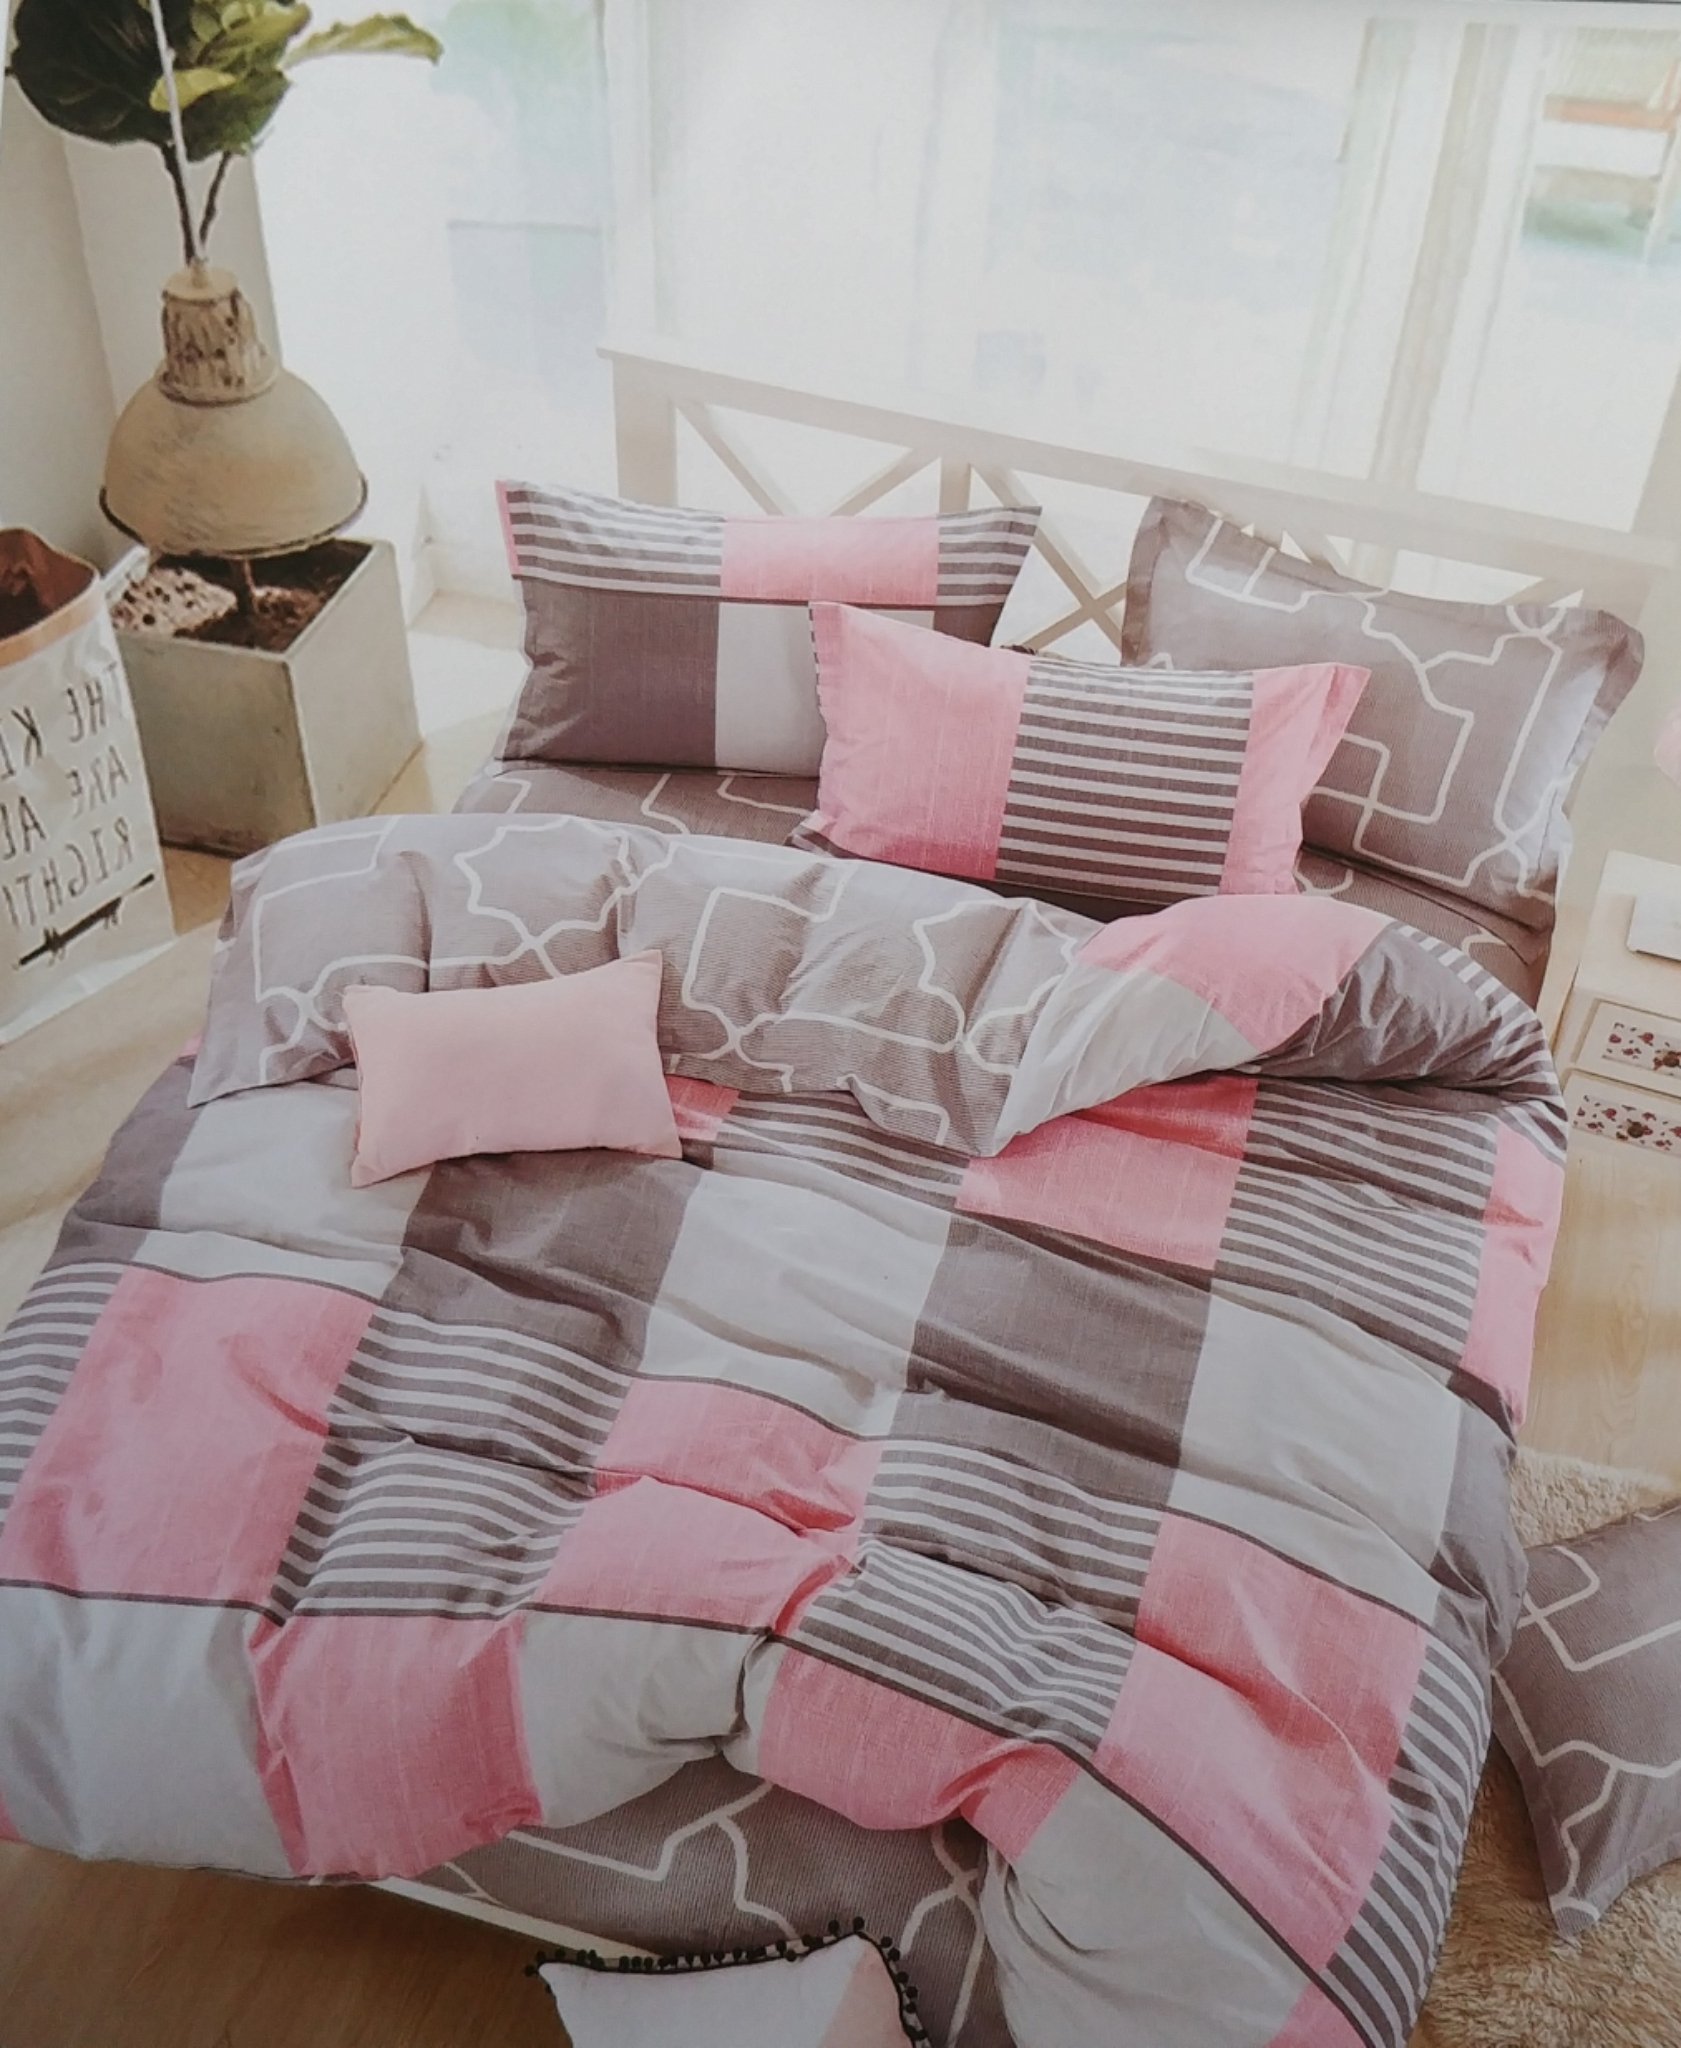 Bickford Home Grid Bedding Set BHG090